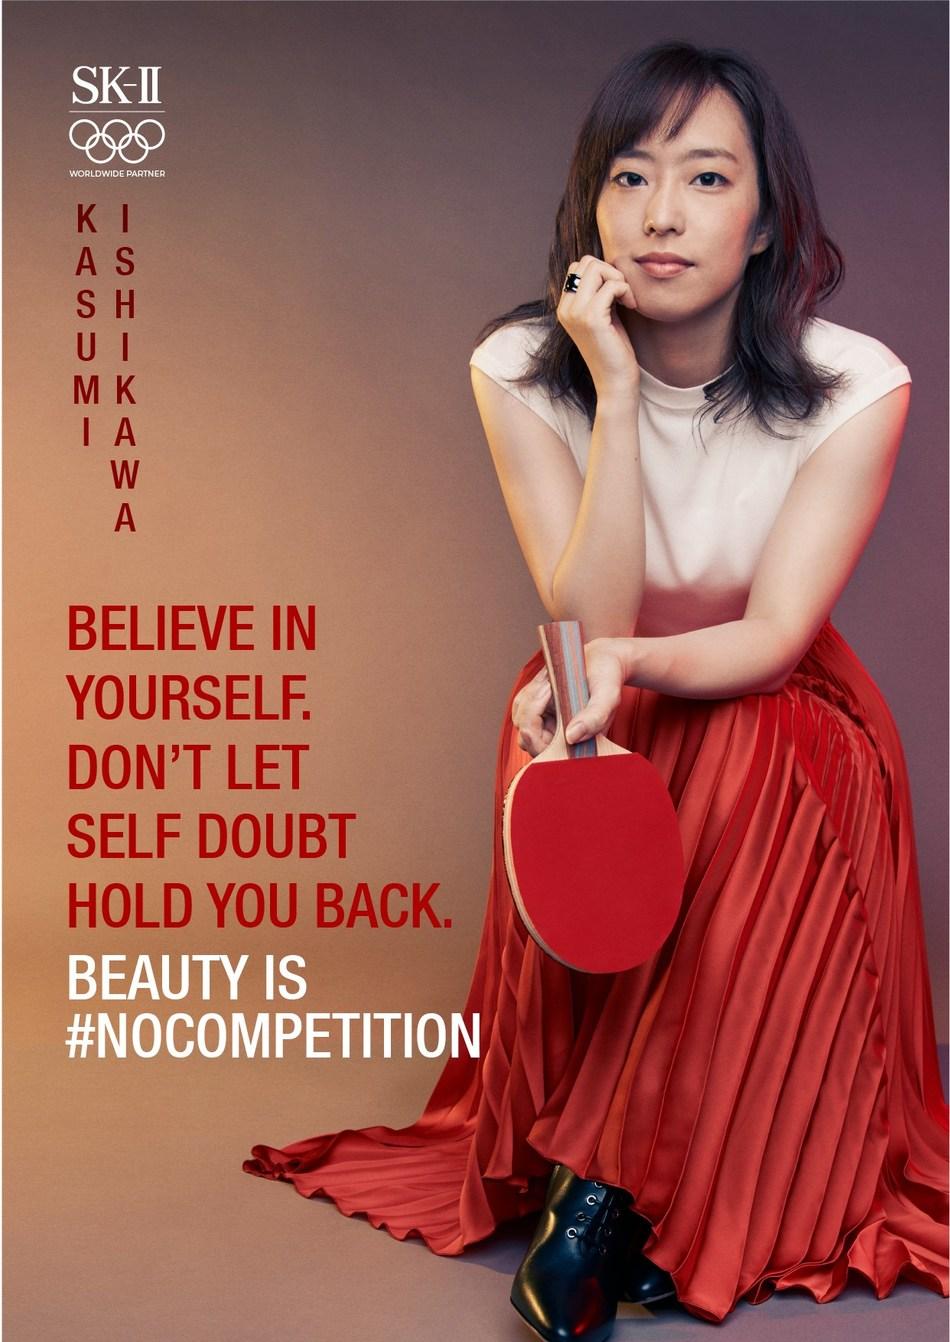 Ishikawa Kasumi declares Beauty is #NOCOMPETITION